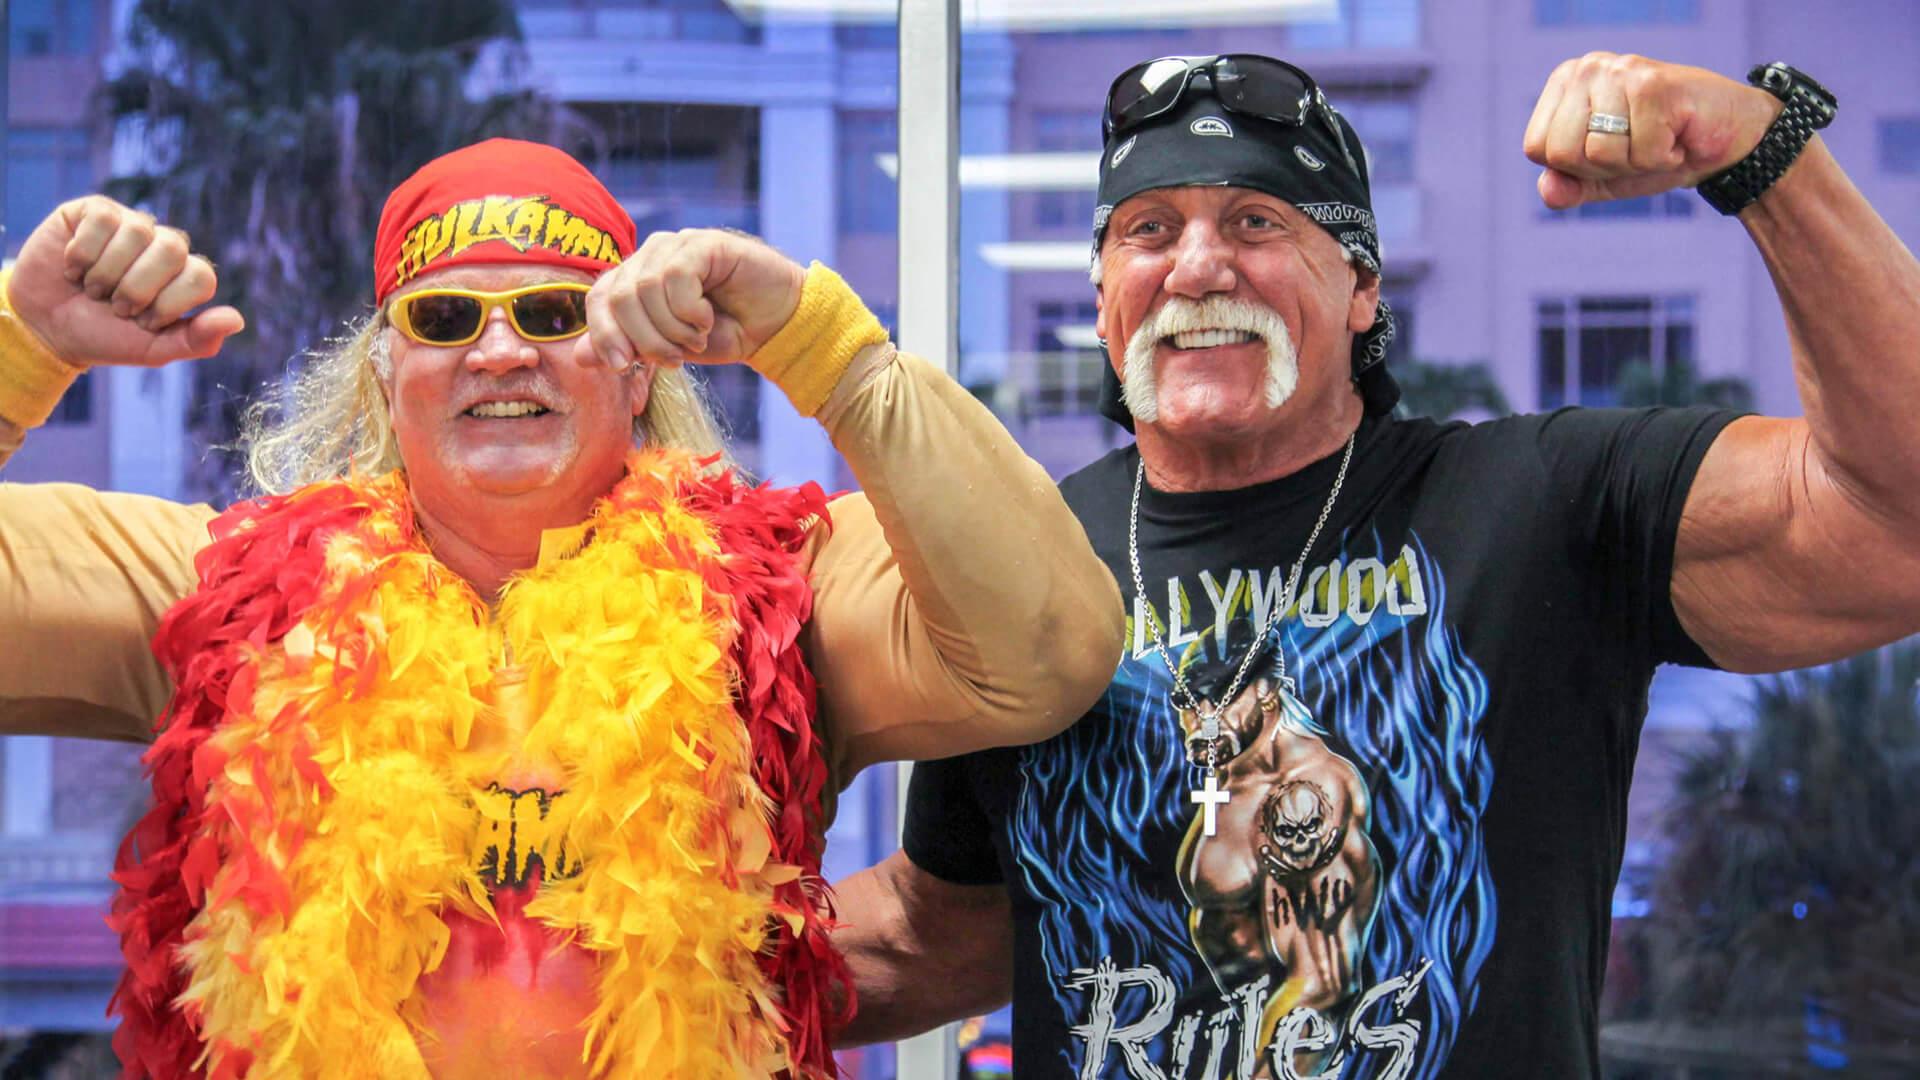 Hulk Hogan Autograph Signing June 23rd